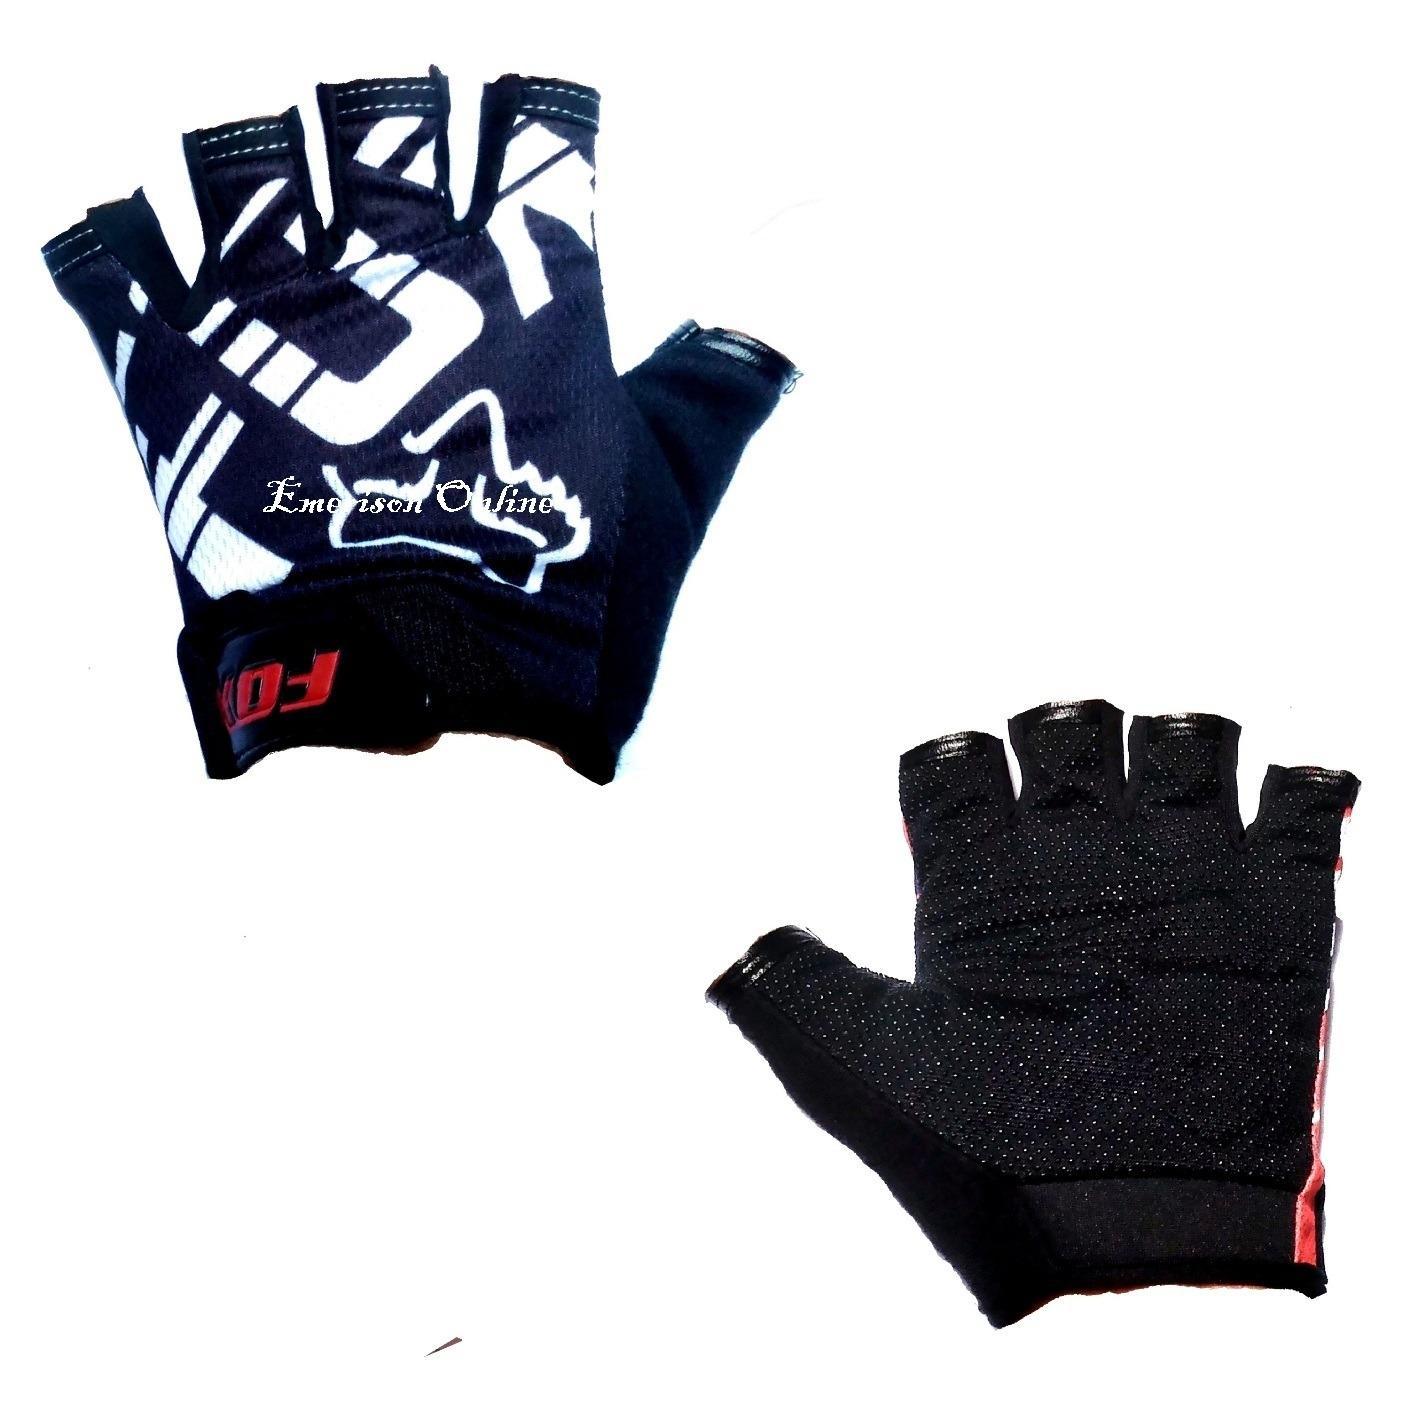 BT0959 Bicycle FDX Bike Half Finger Safety Gloves (Black-White)